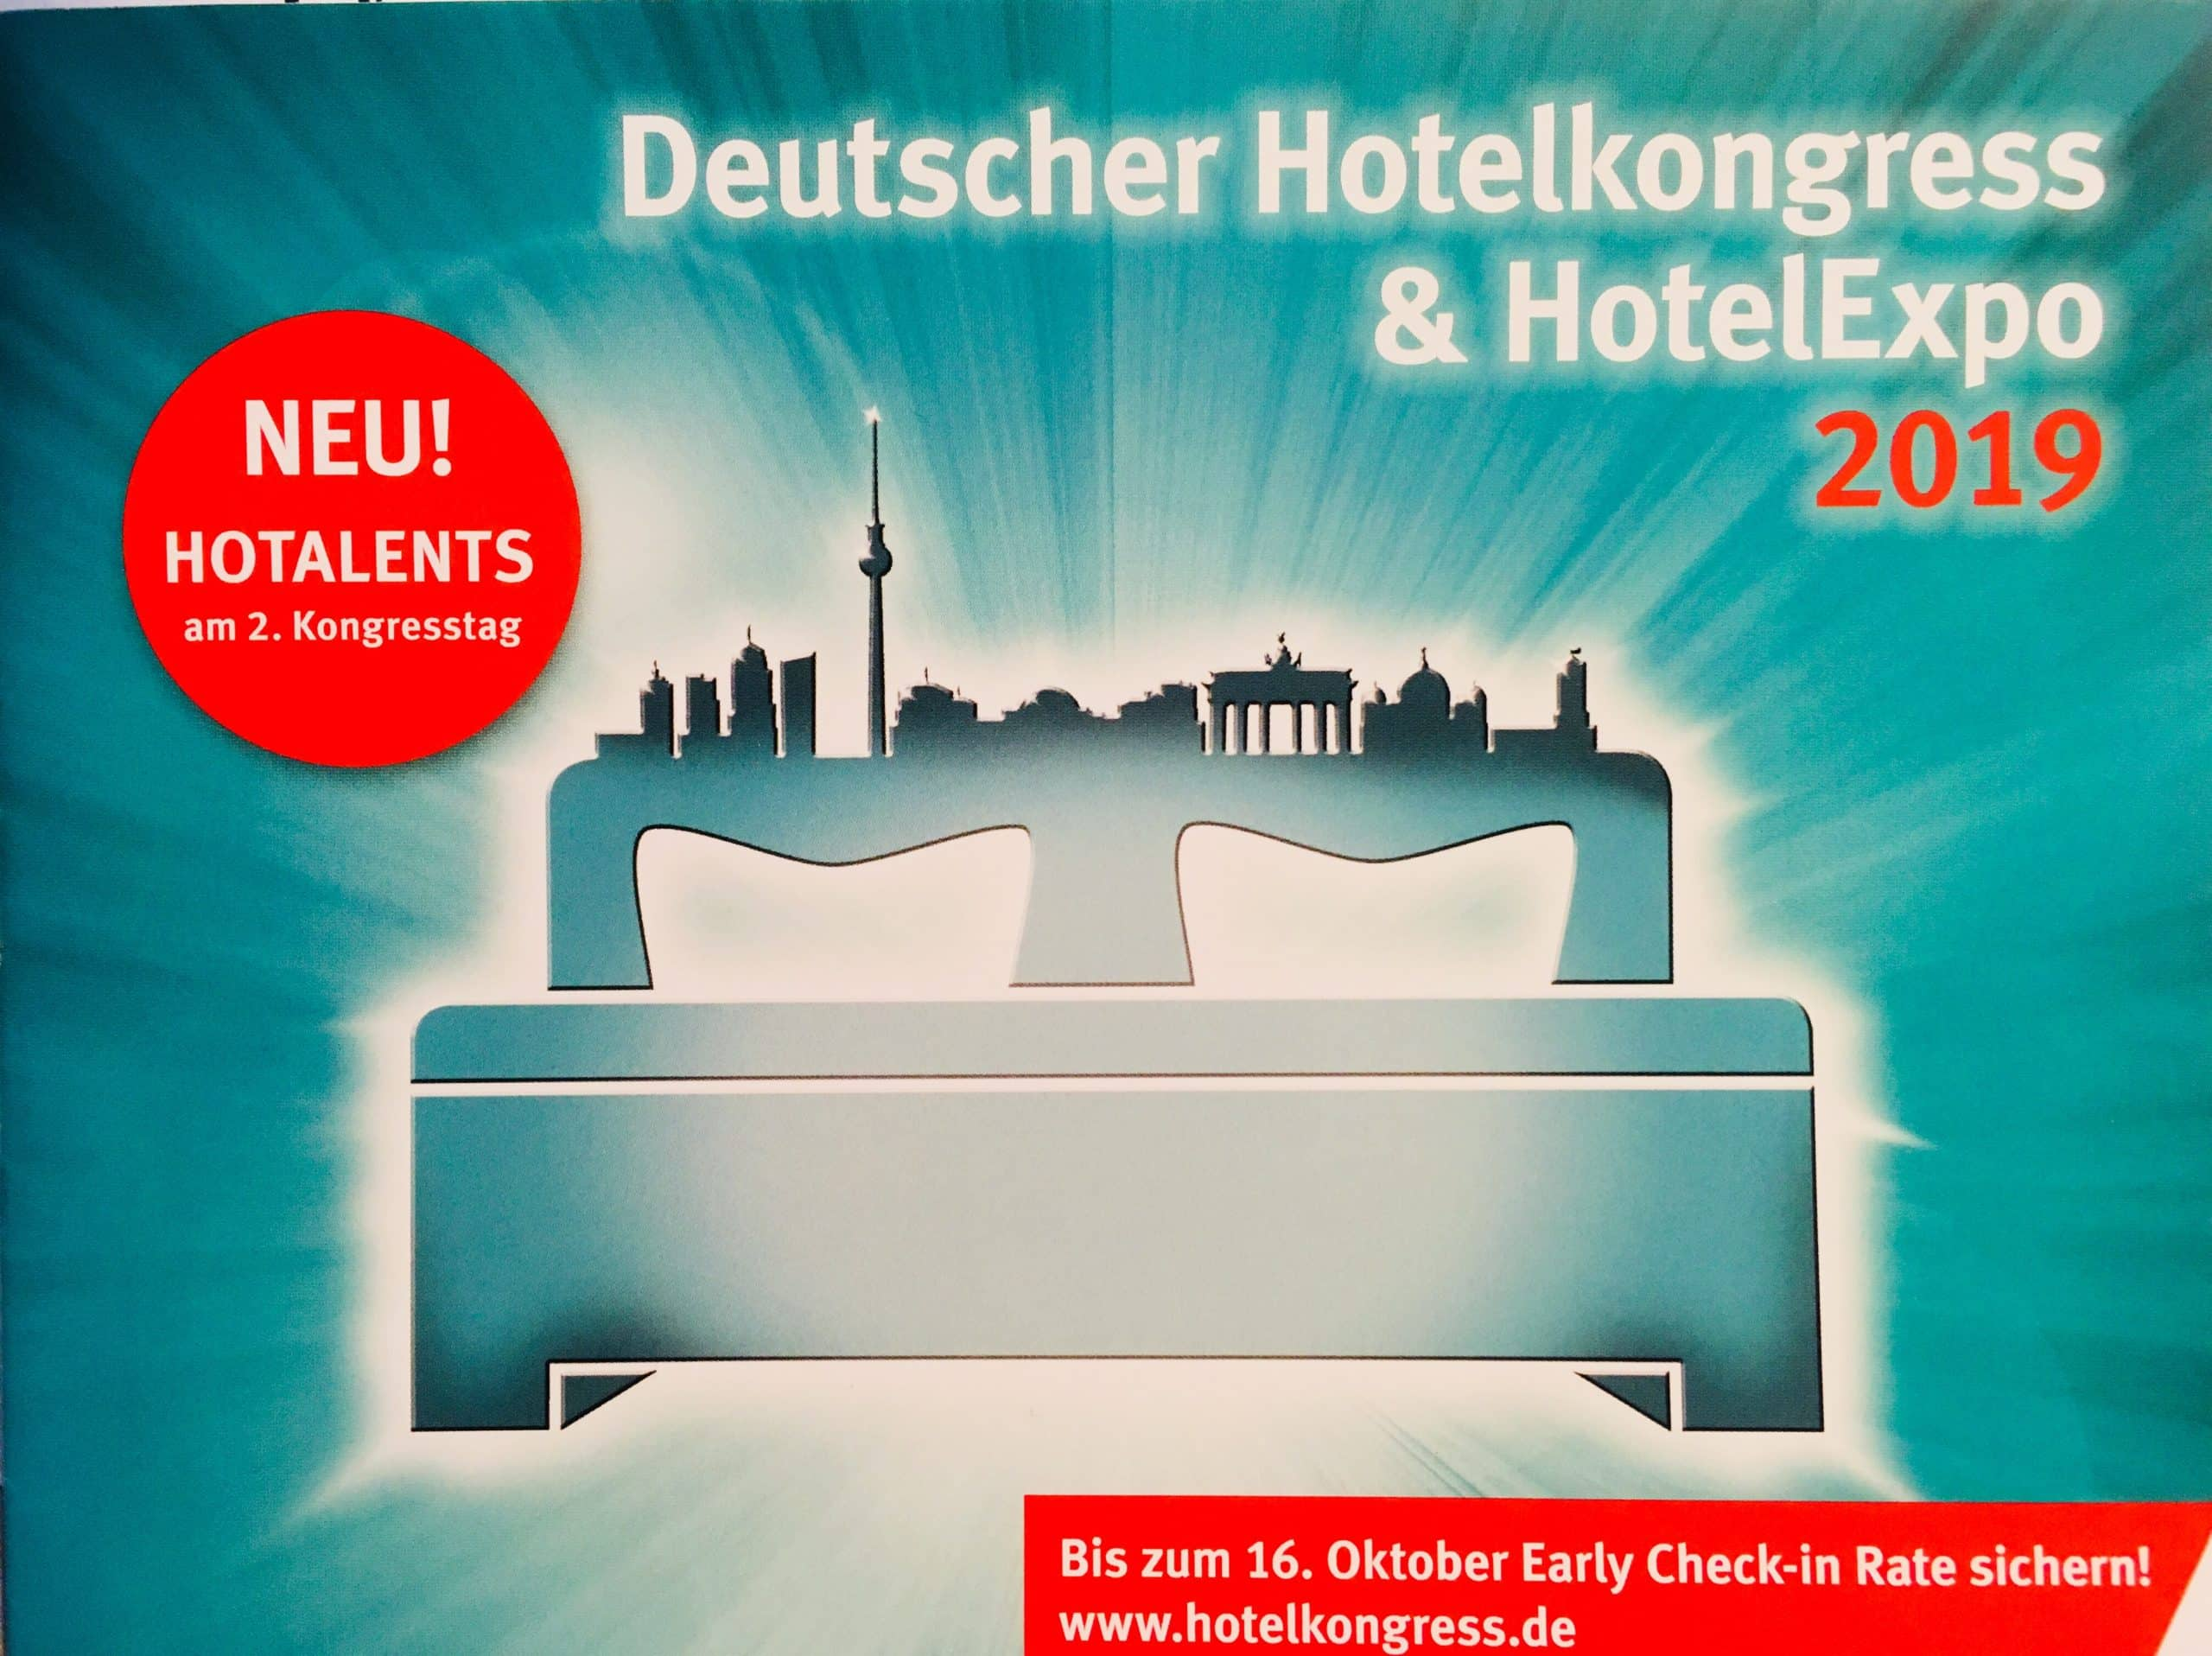 Deutscher Hotelkongress 2019